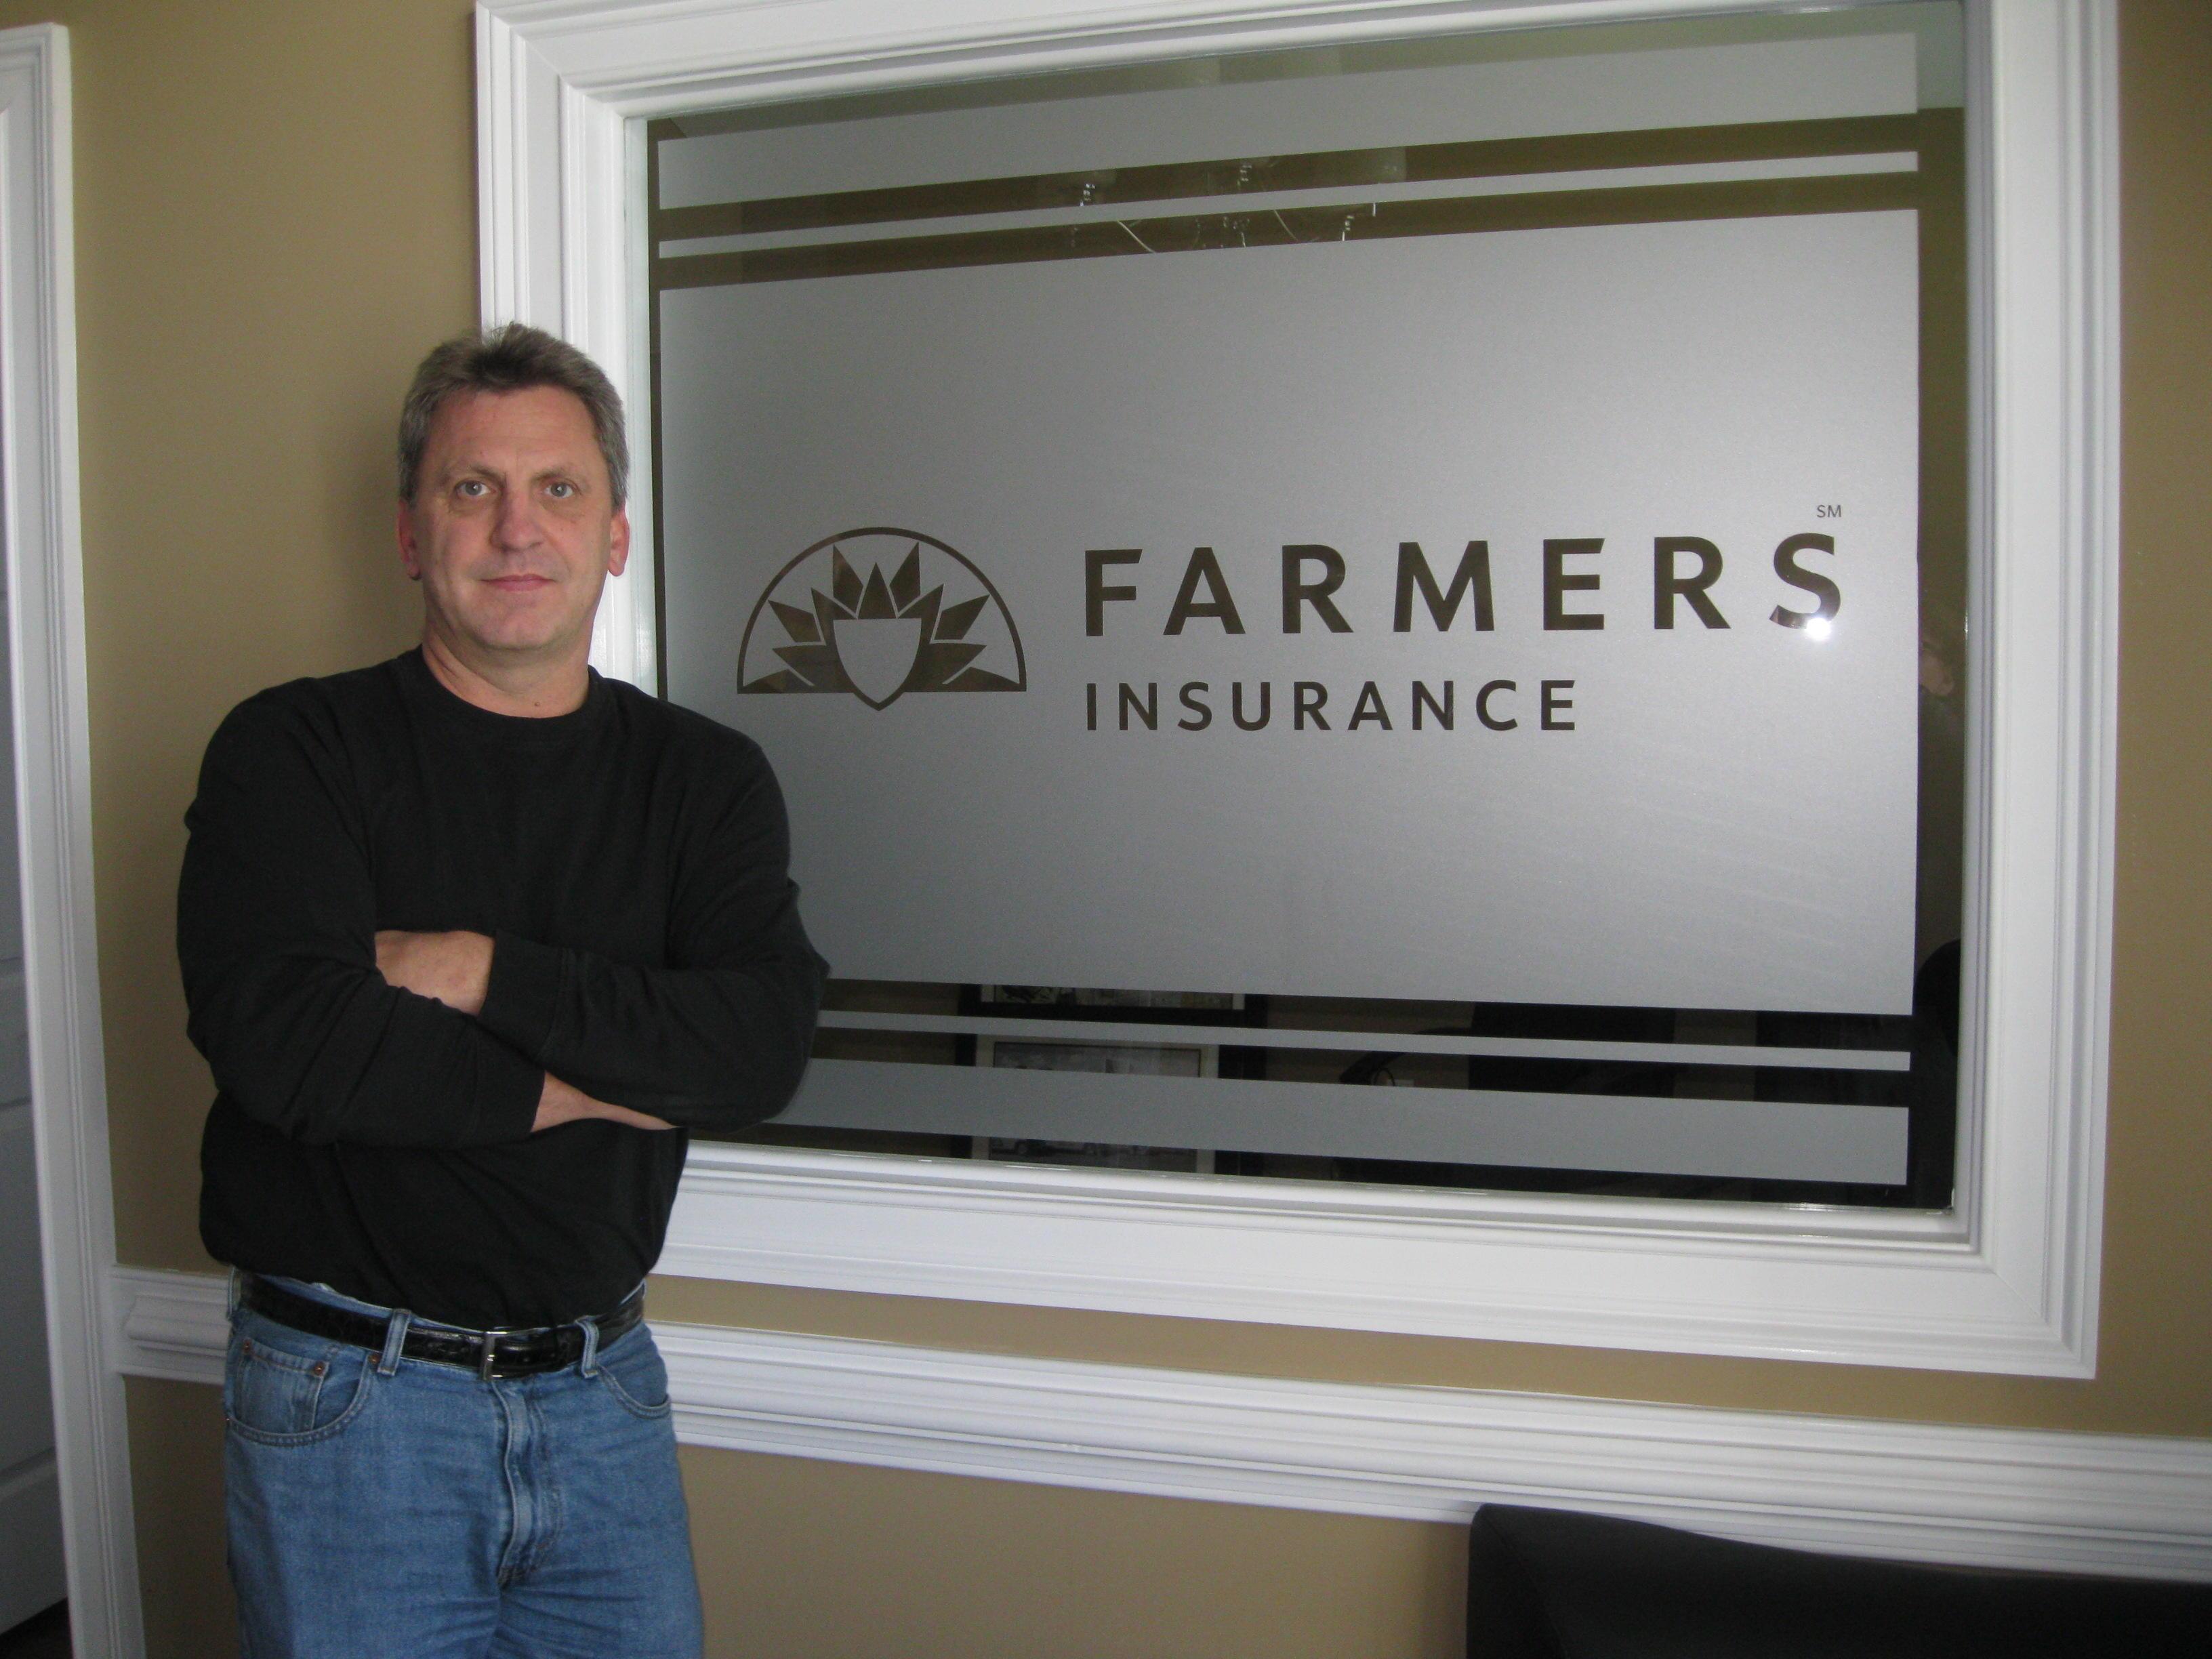 Farmers Insurance - Christopher Zercher image 2